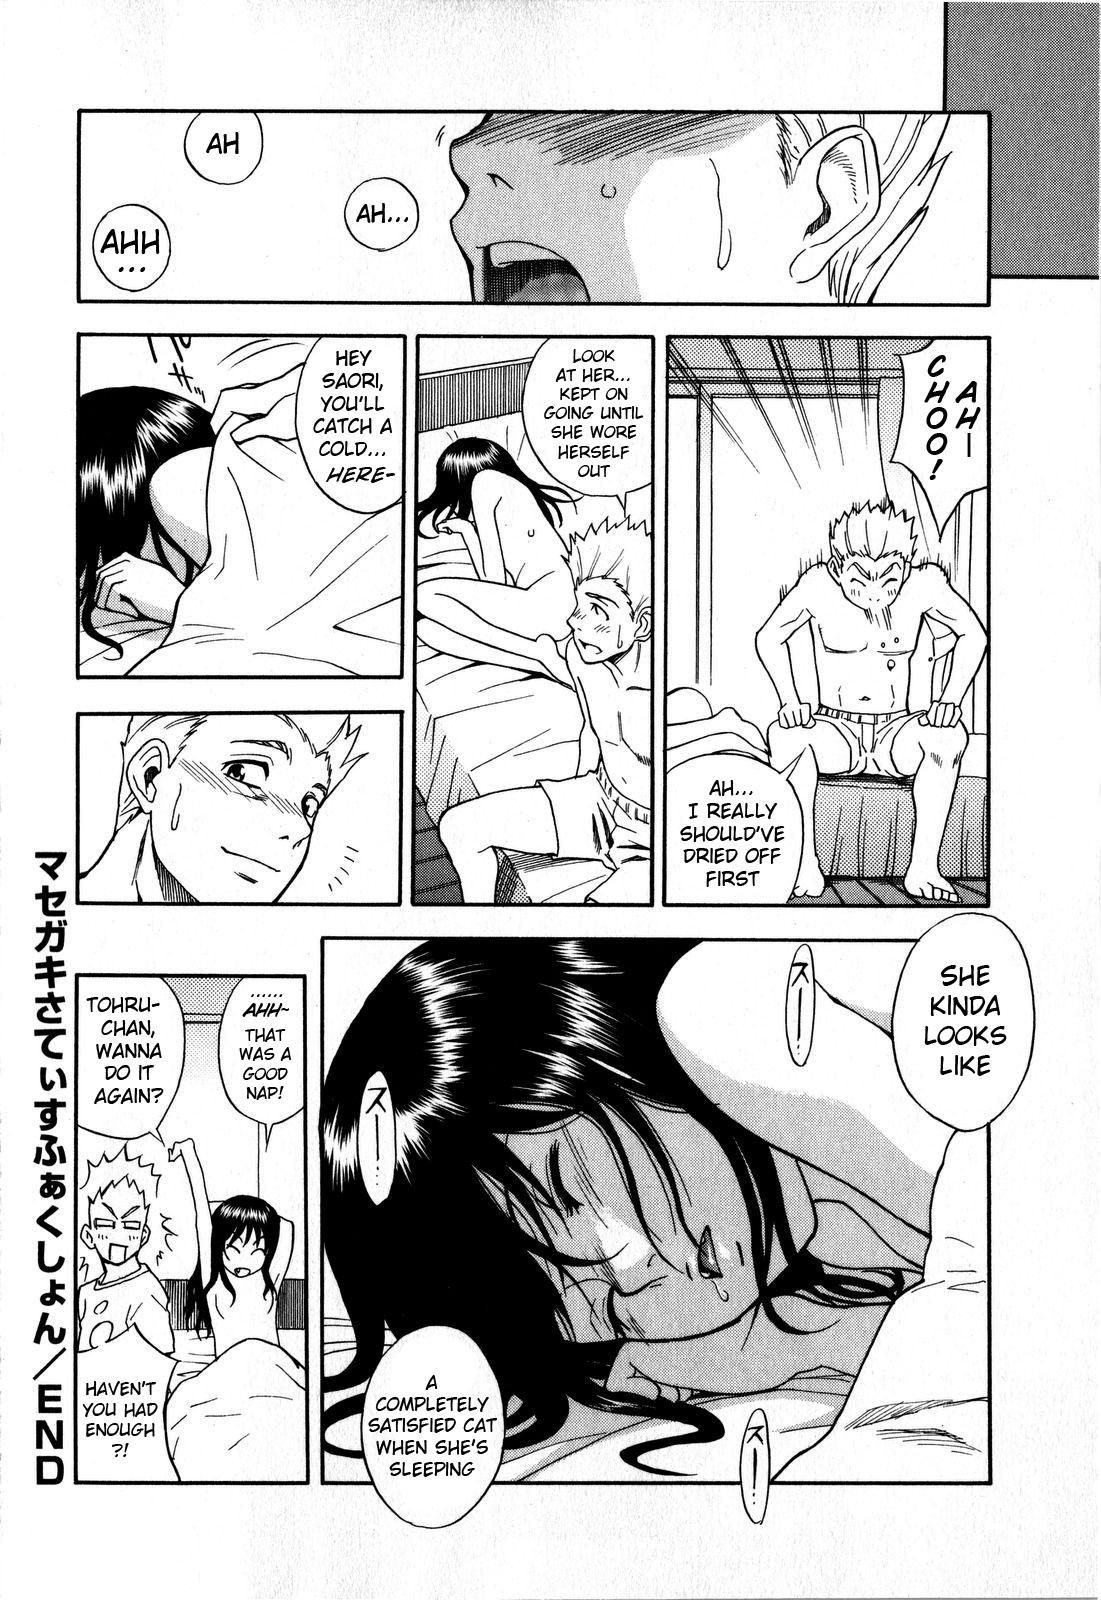 [Shiden Akira] Masegaki Temptation (Cute + Sexy = Little Devil!?) + Masegaki Satisfaction [English] [Decensored] 42